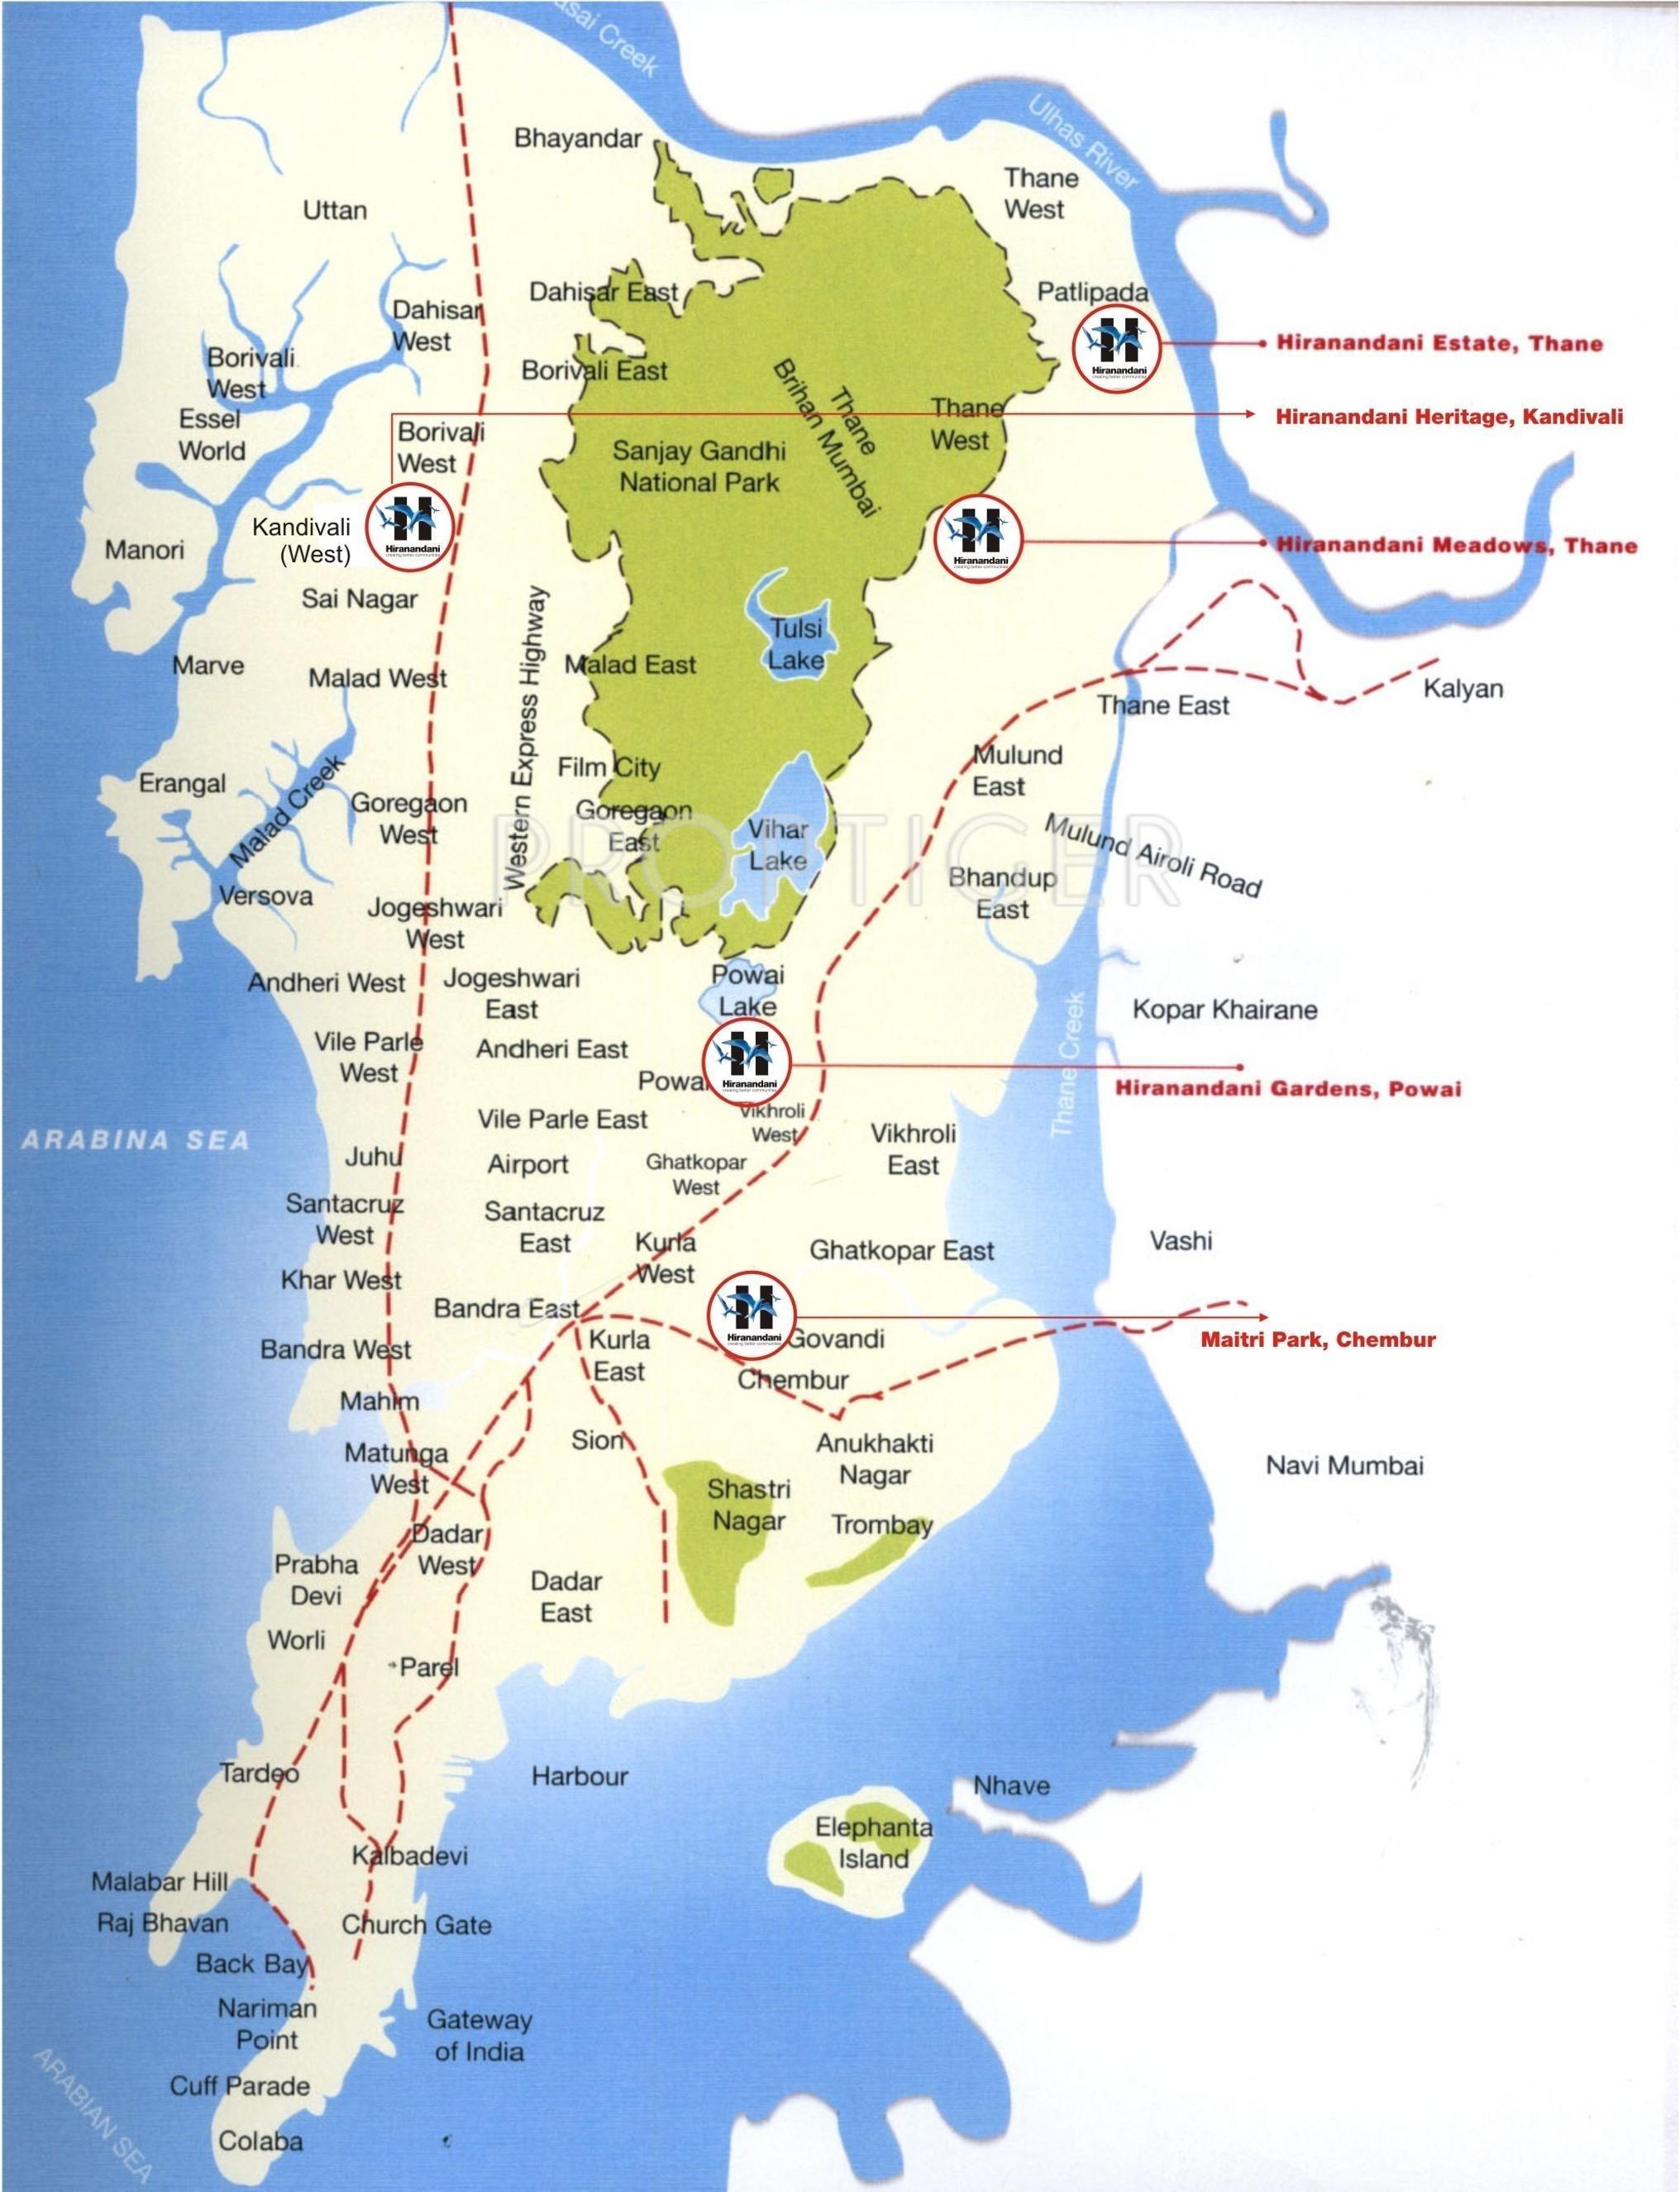 Colaba mumbai mapa mapa de colaba mumbai maharashtra india mapa de colaba mumbai gumiabroncs Gallery